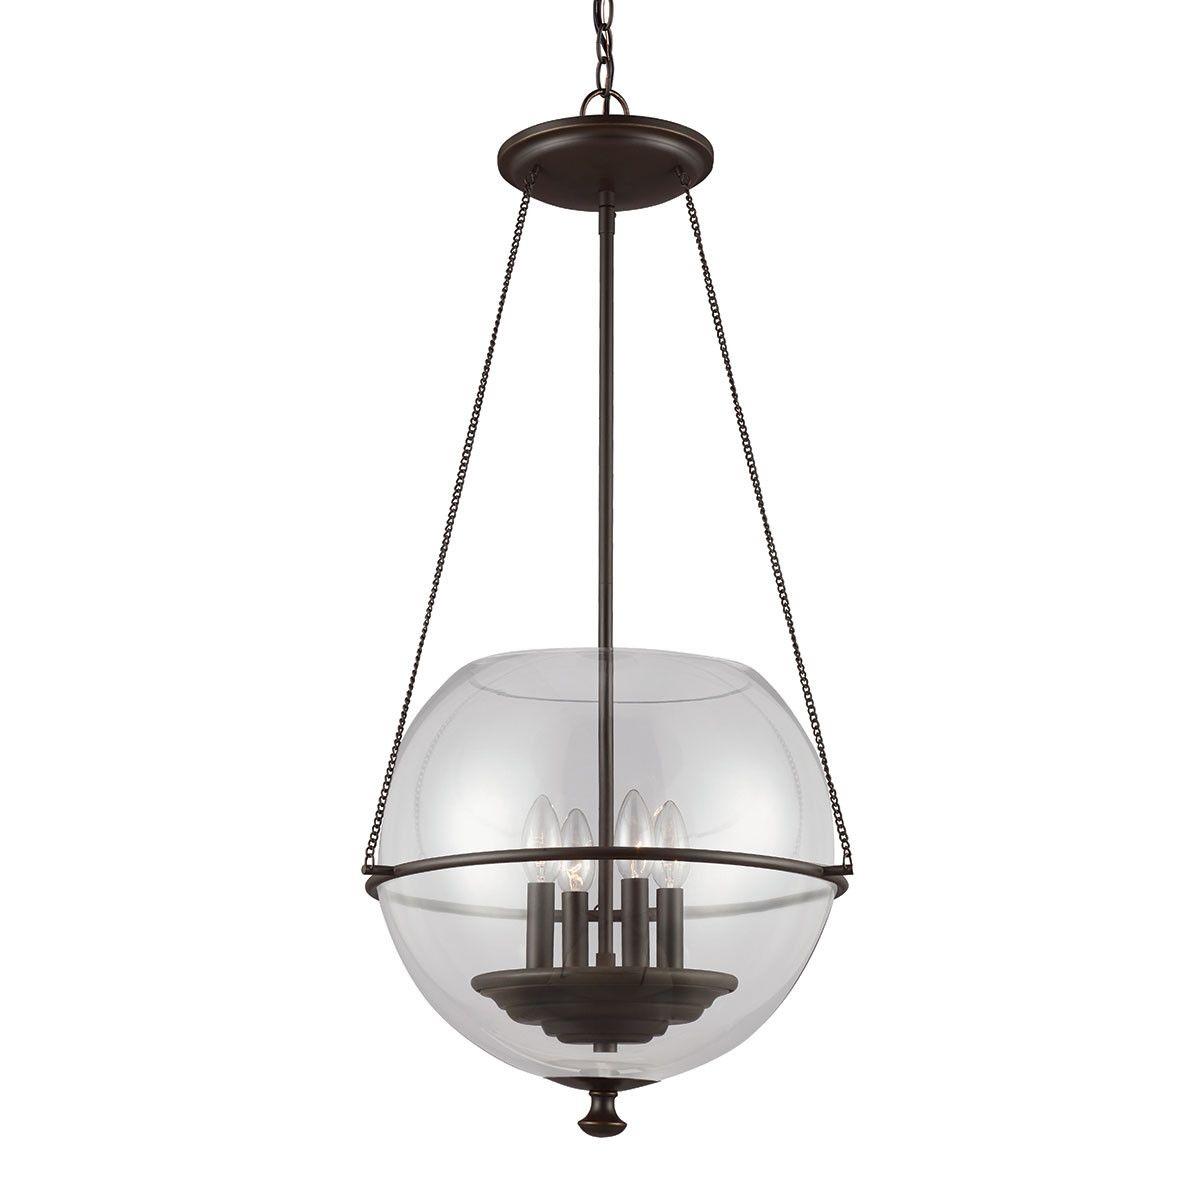 Havenwood pendant pendants light pendant and lights